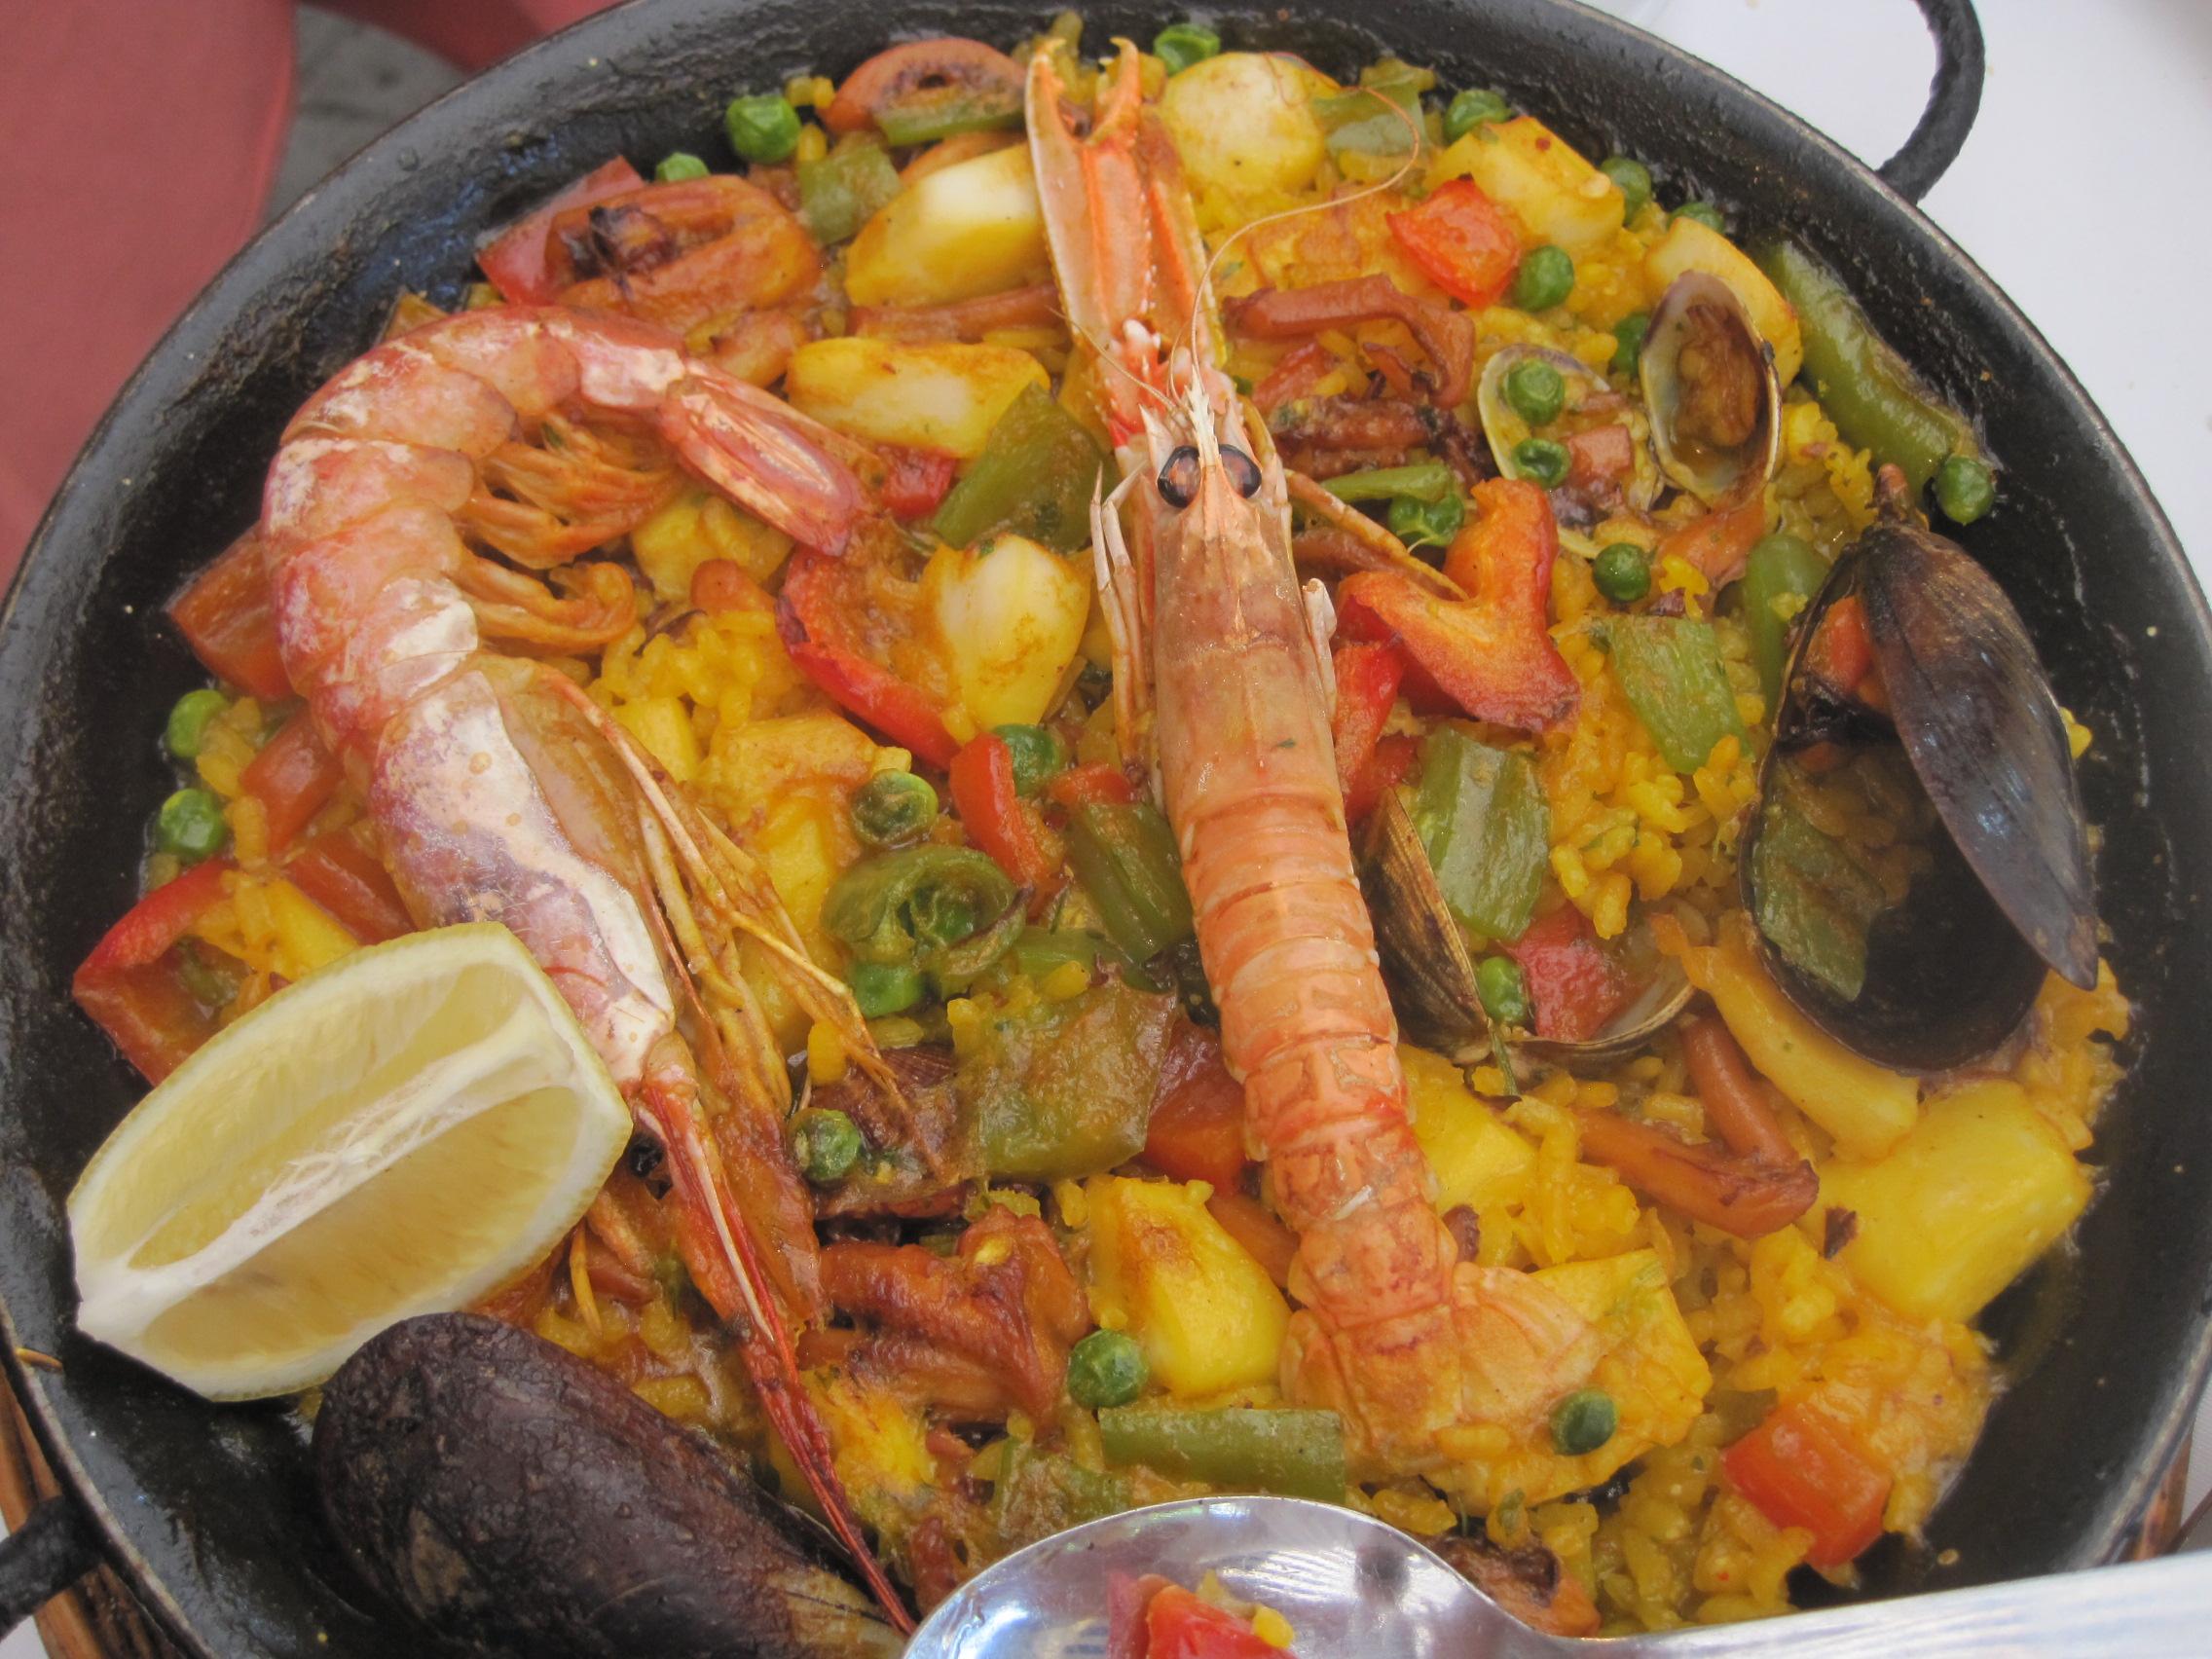 На кухне, En la cocina, Испанский язык, аудиоуроки